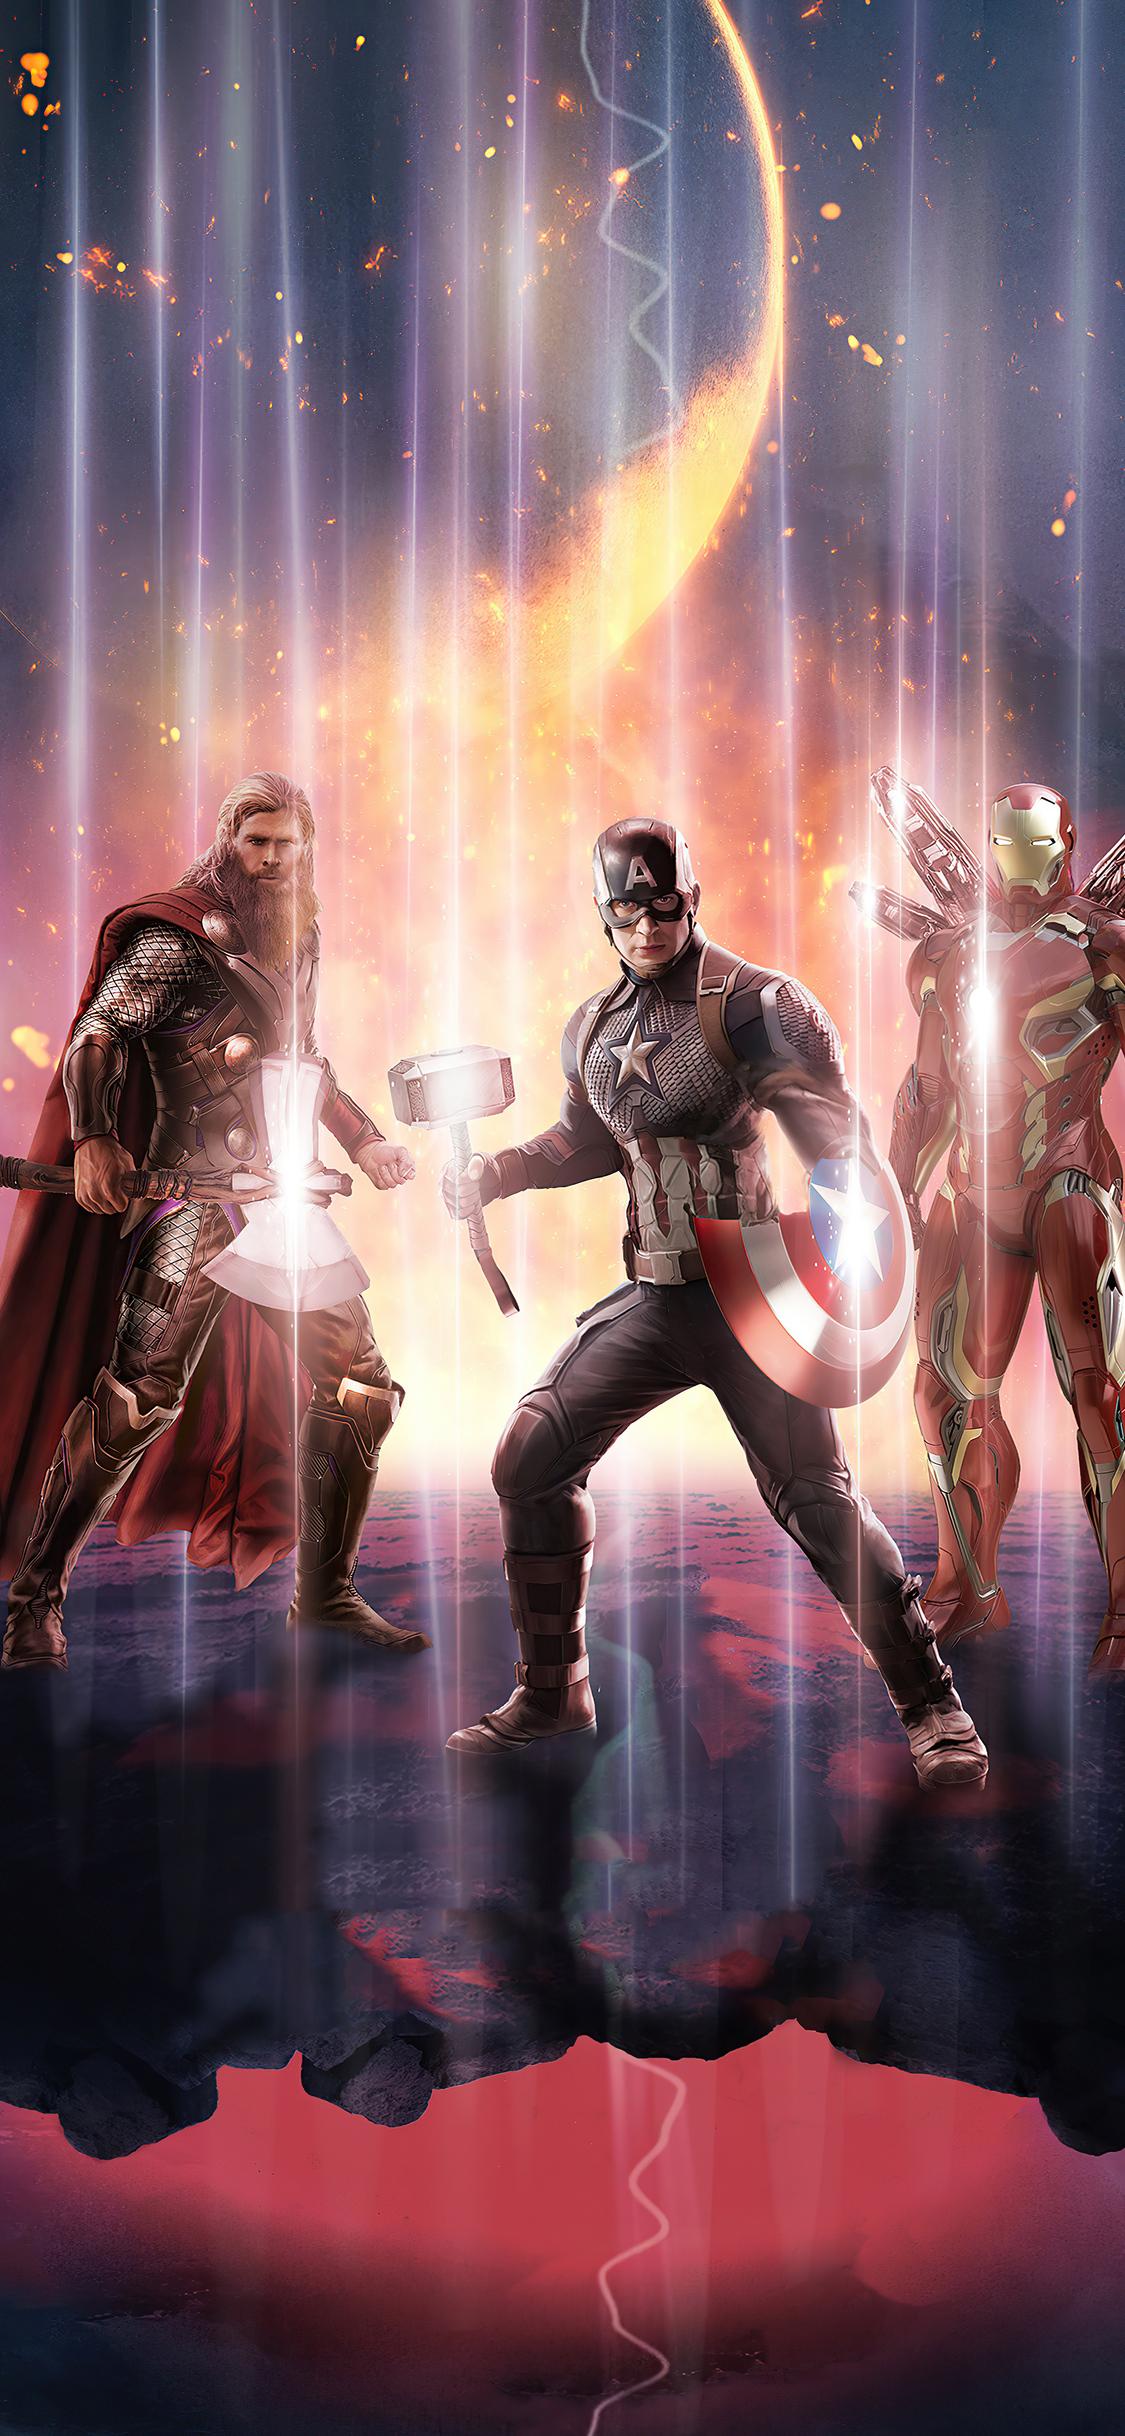 captain-america-thor-iron-man-avengers-end-game-4k-ff.jpg